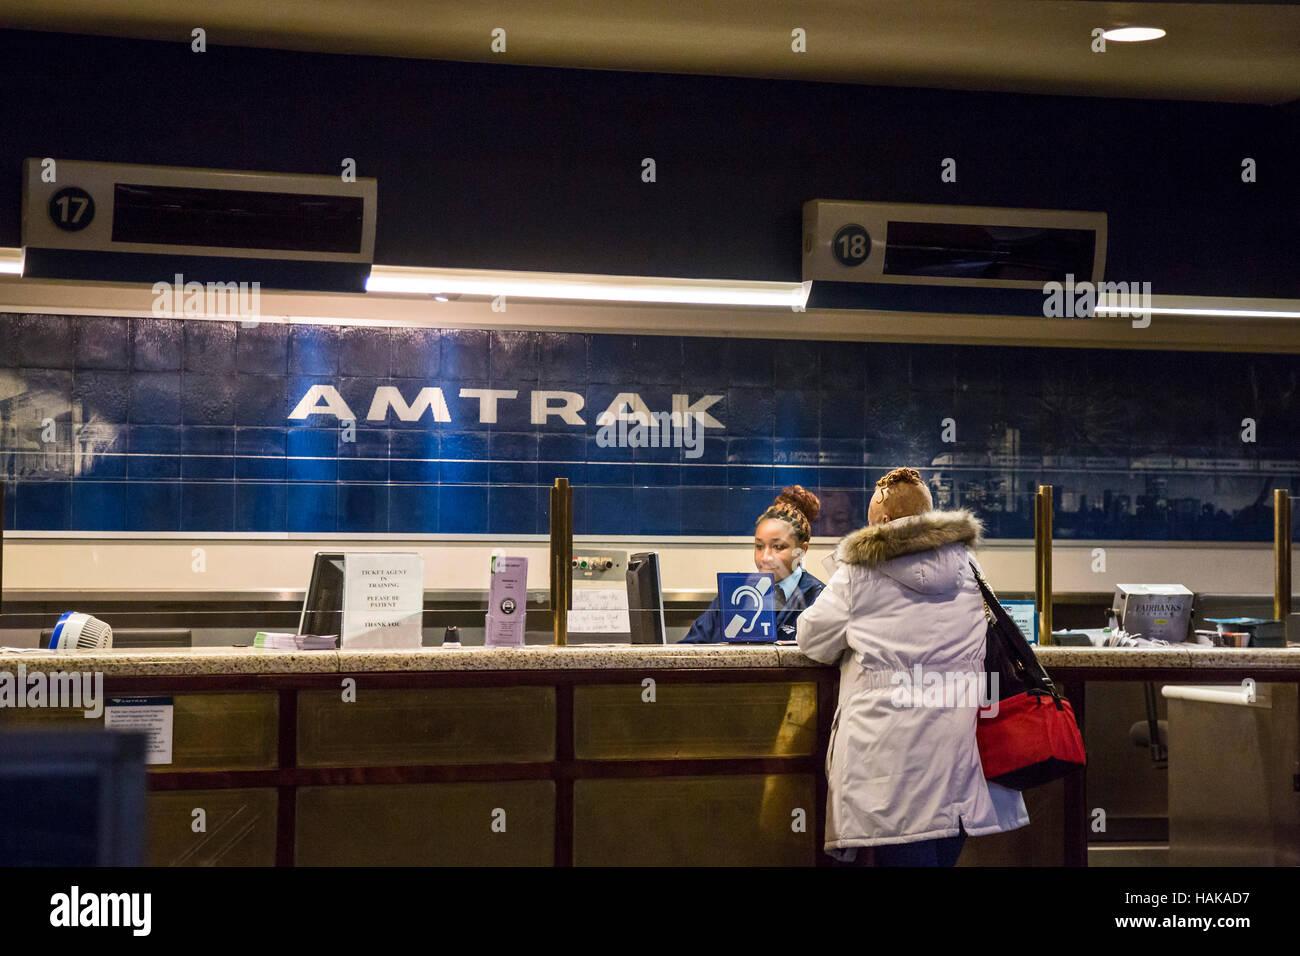 Washington, DC - The Amtrak ticket counter at Union Station. - Stock Image